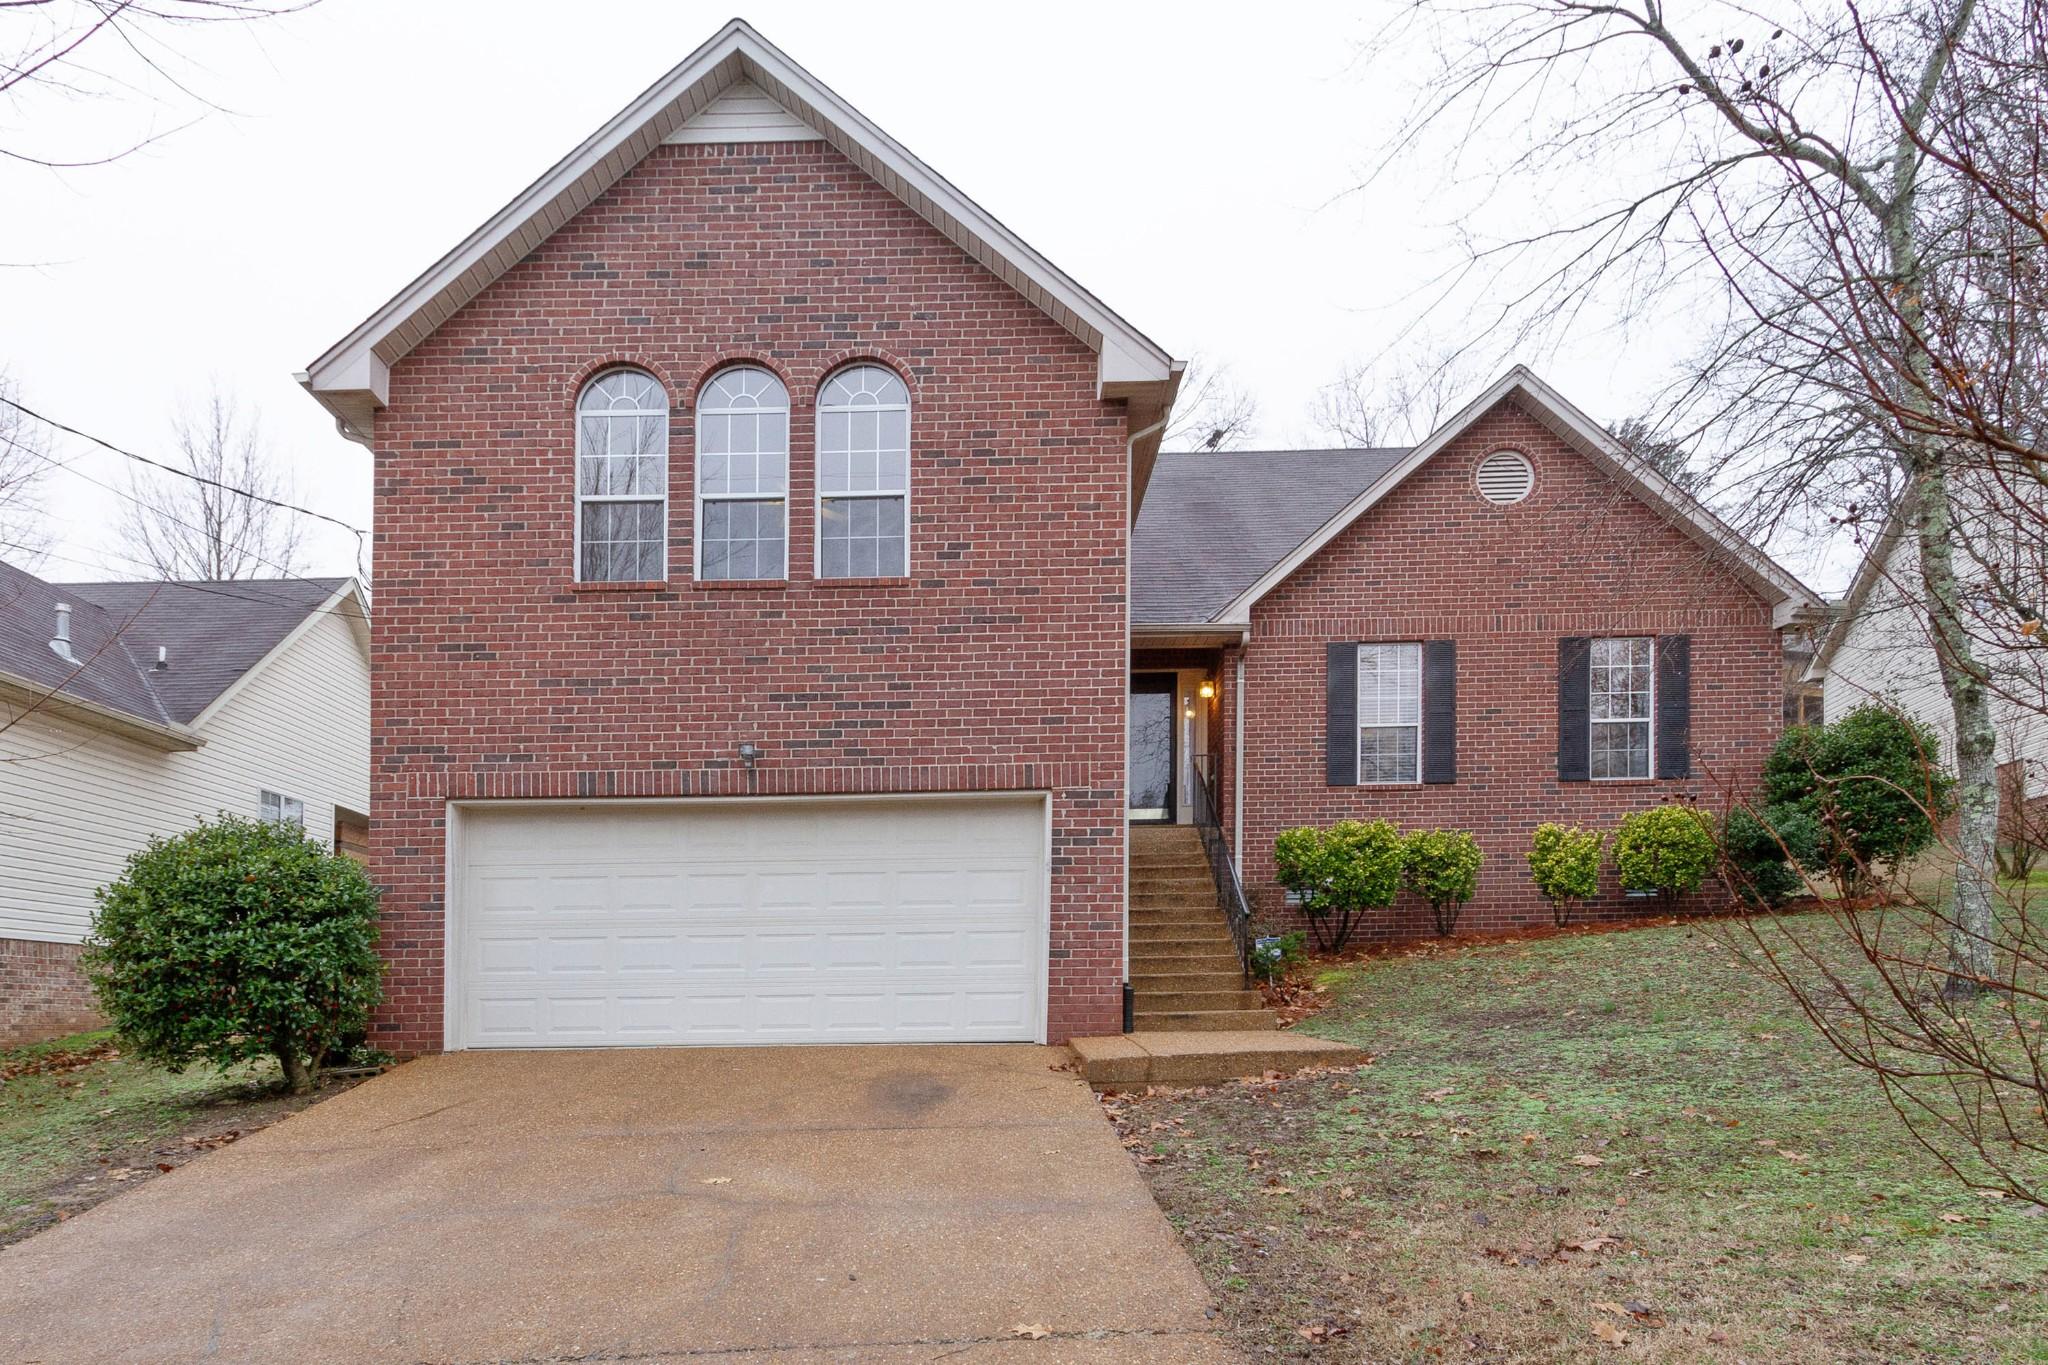 1817 Bryce Cir, Nashville, TN 37211 - Nashville, TN real estate listing